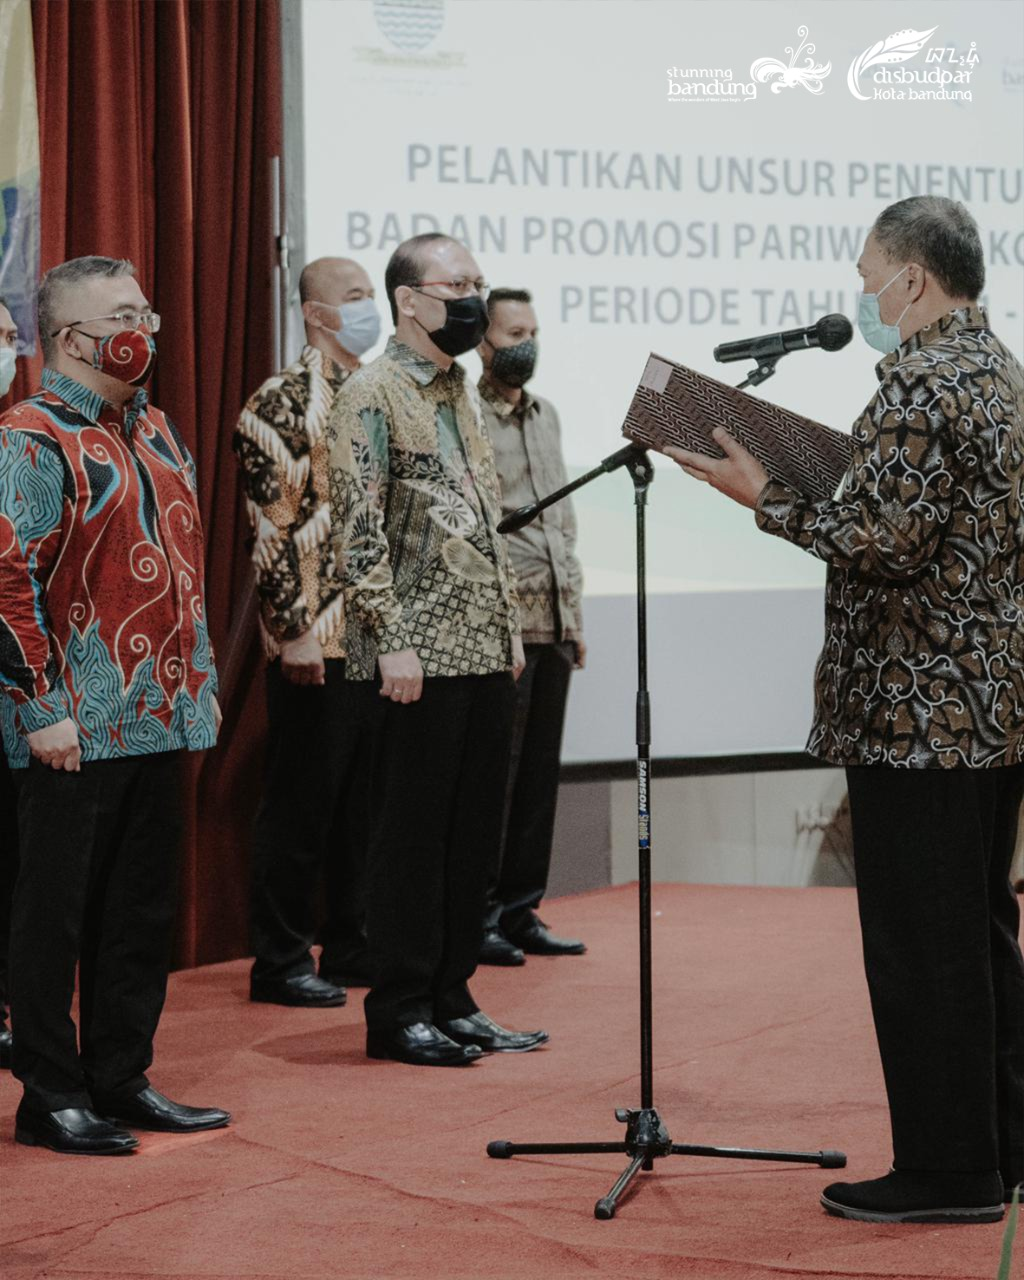 Pelantikan Unsur Penentu Kebijakan Badan Promosi Pariwisata Kota Bandung Periode 2021-2025